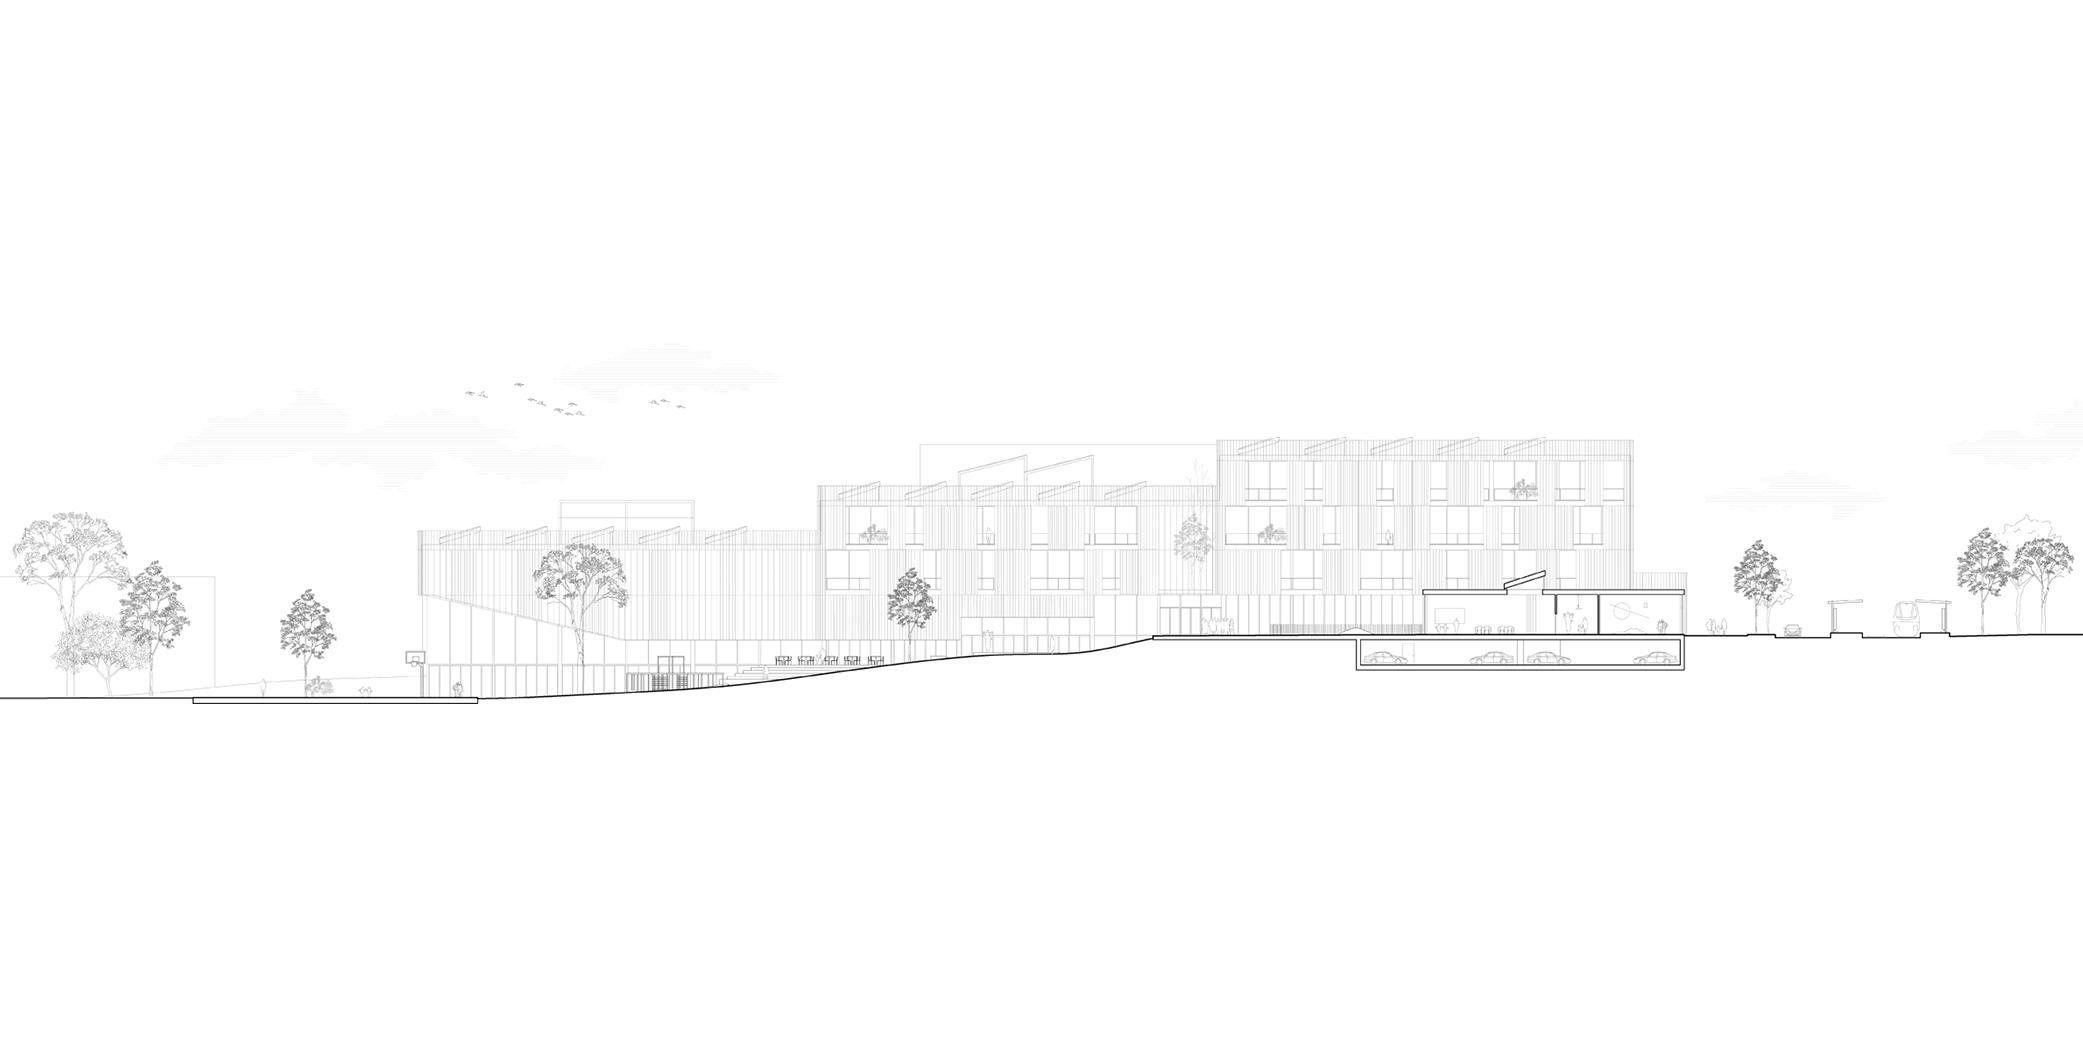 OCA architects New Elementary School and Kindergarten for - Nová ZS a MS pro - Dolní Měcholupy Hernan Lleida Ruiz Bernardo Garcia Morales21